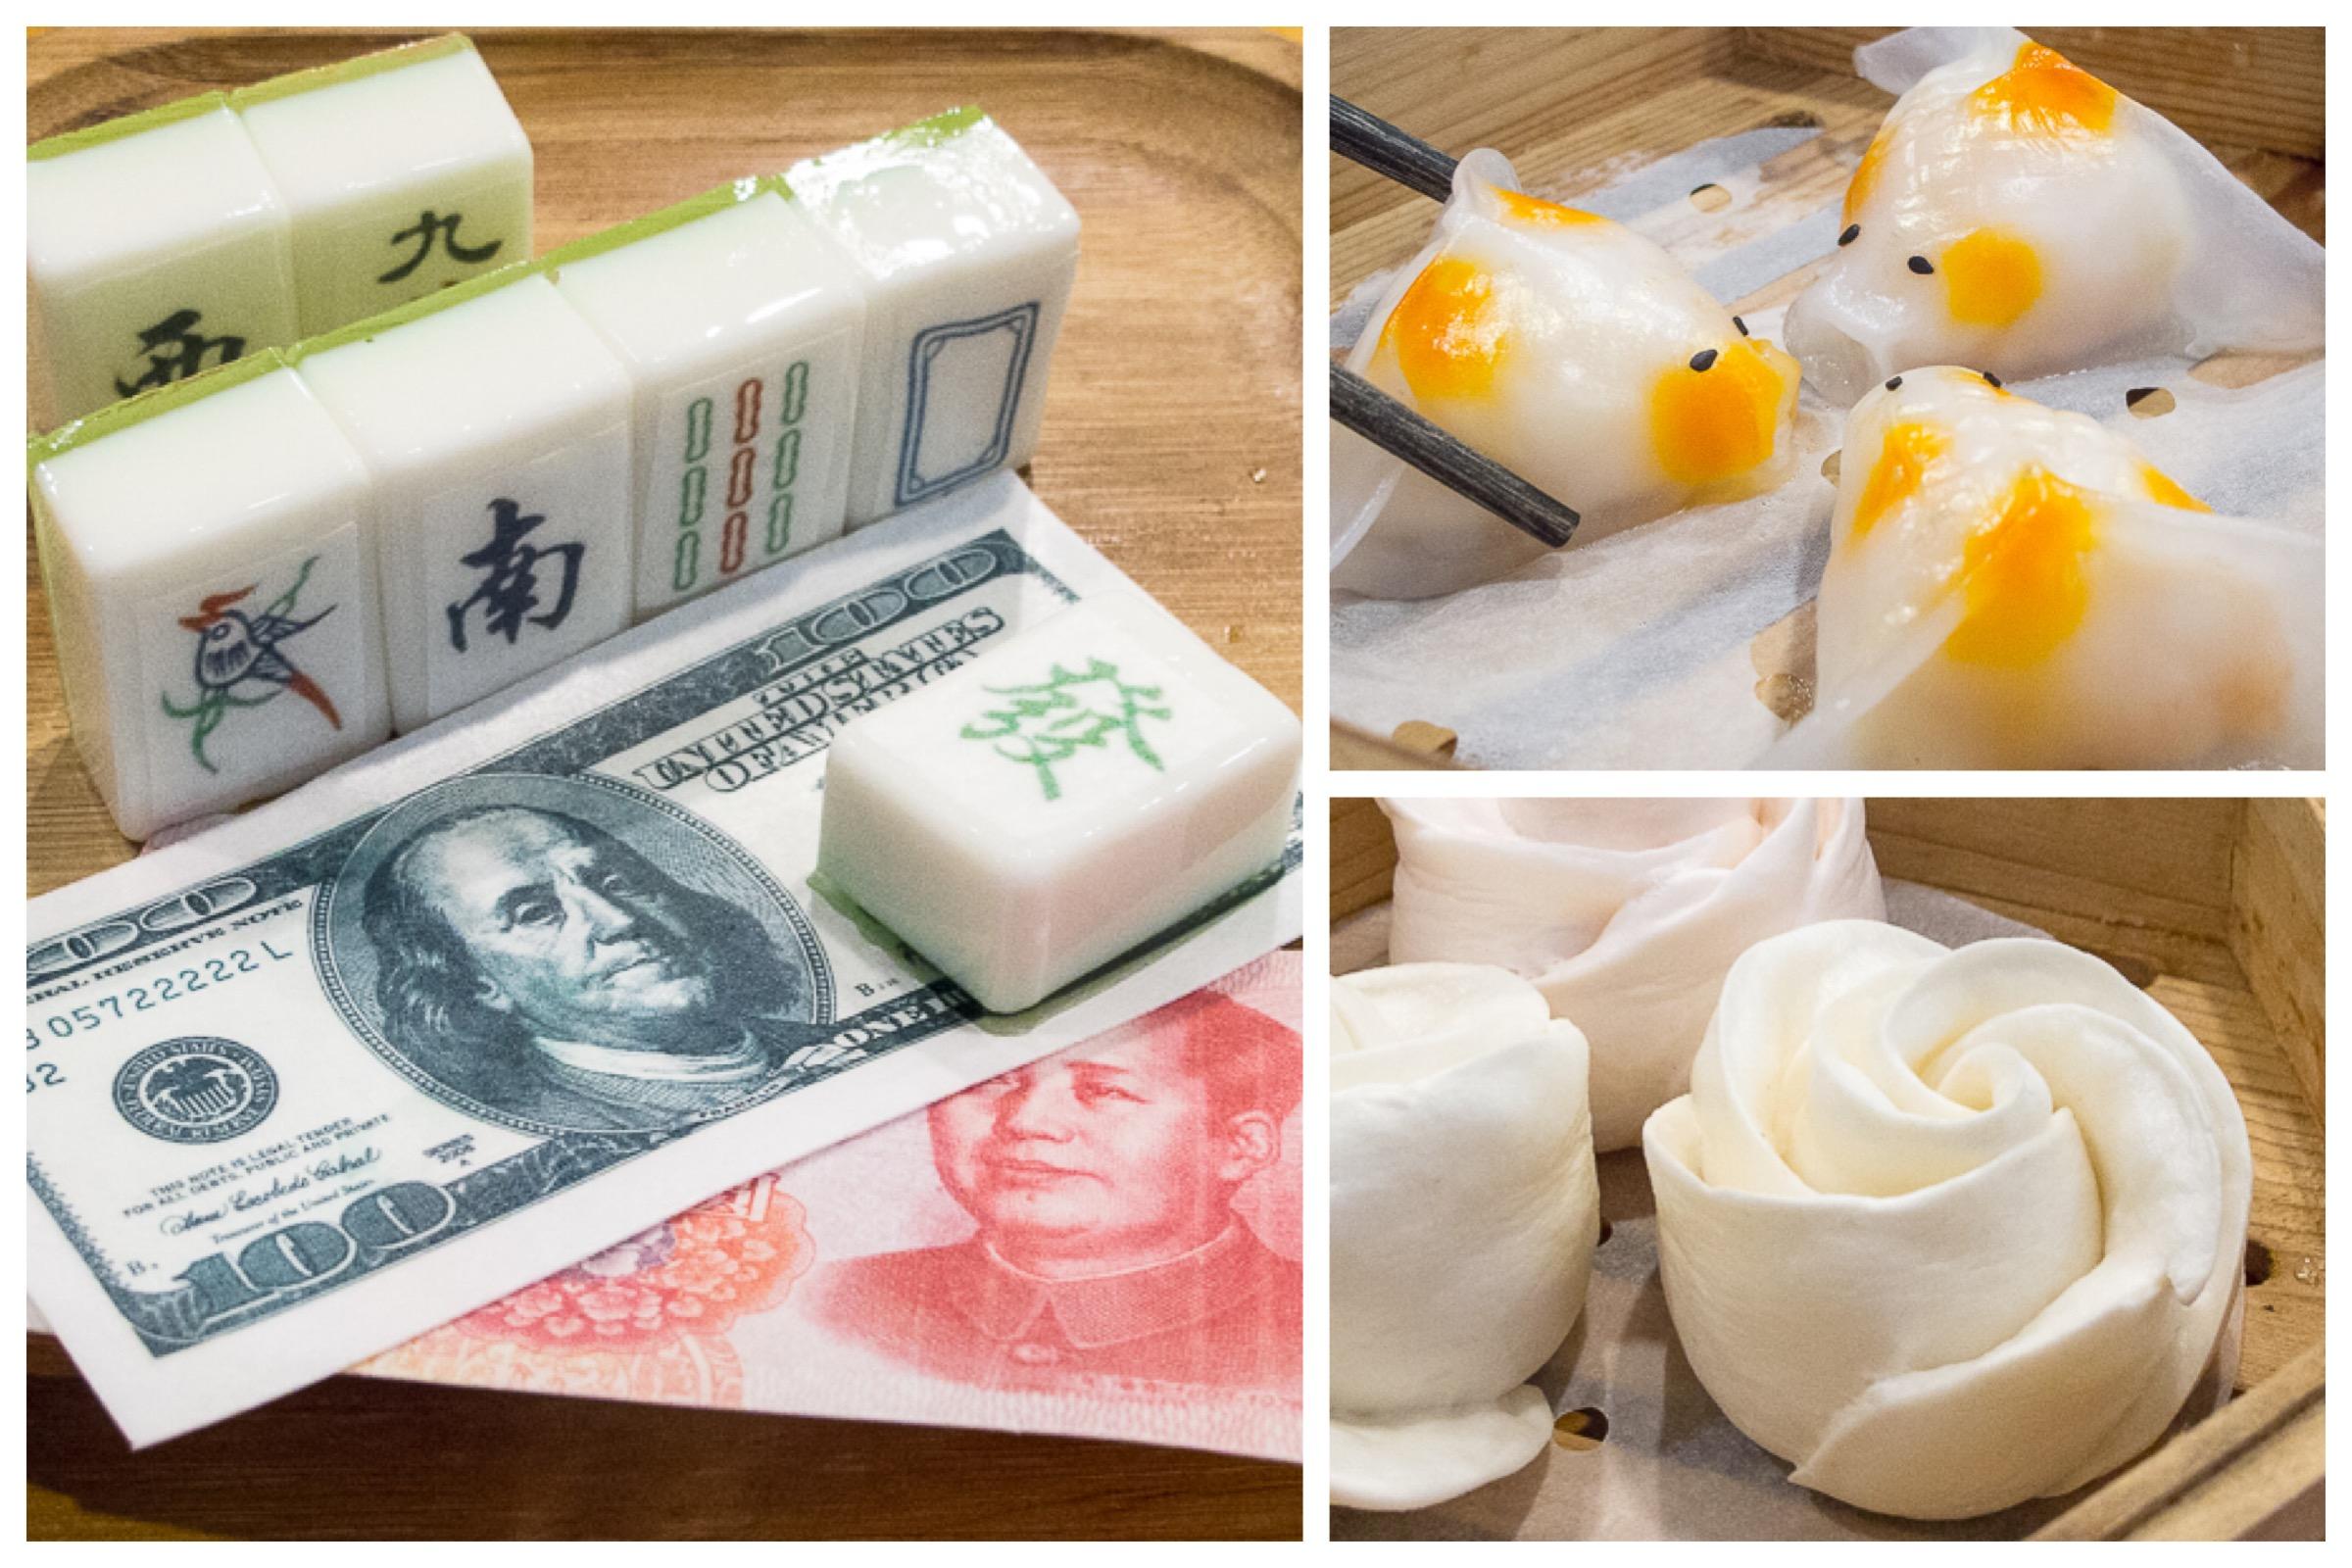 Ming Bistro 名館 – Cute, Animal Dim Sum And Edible Mahjong